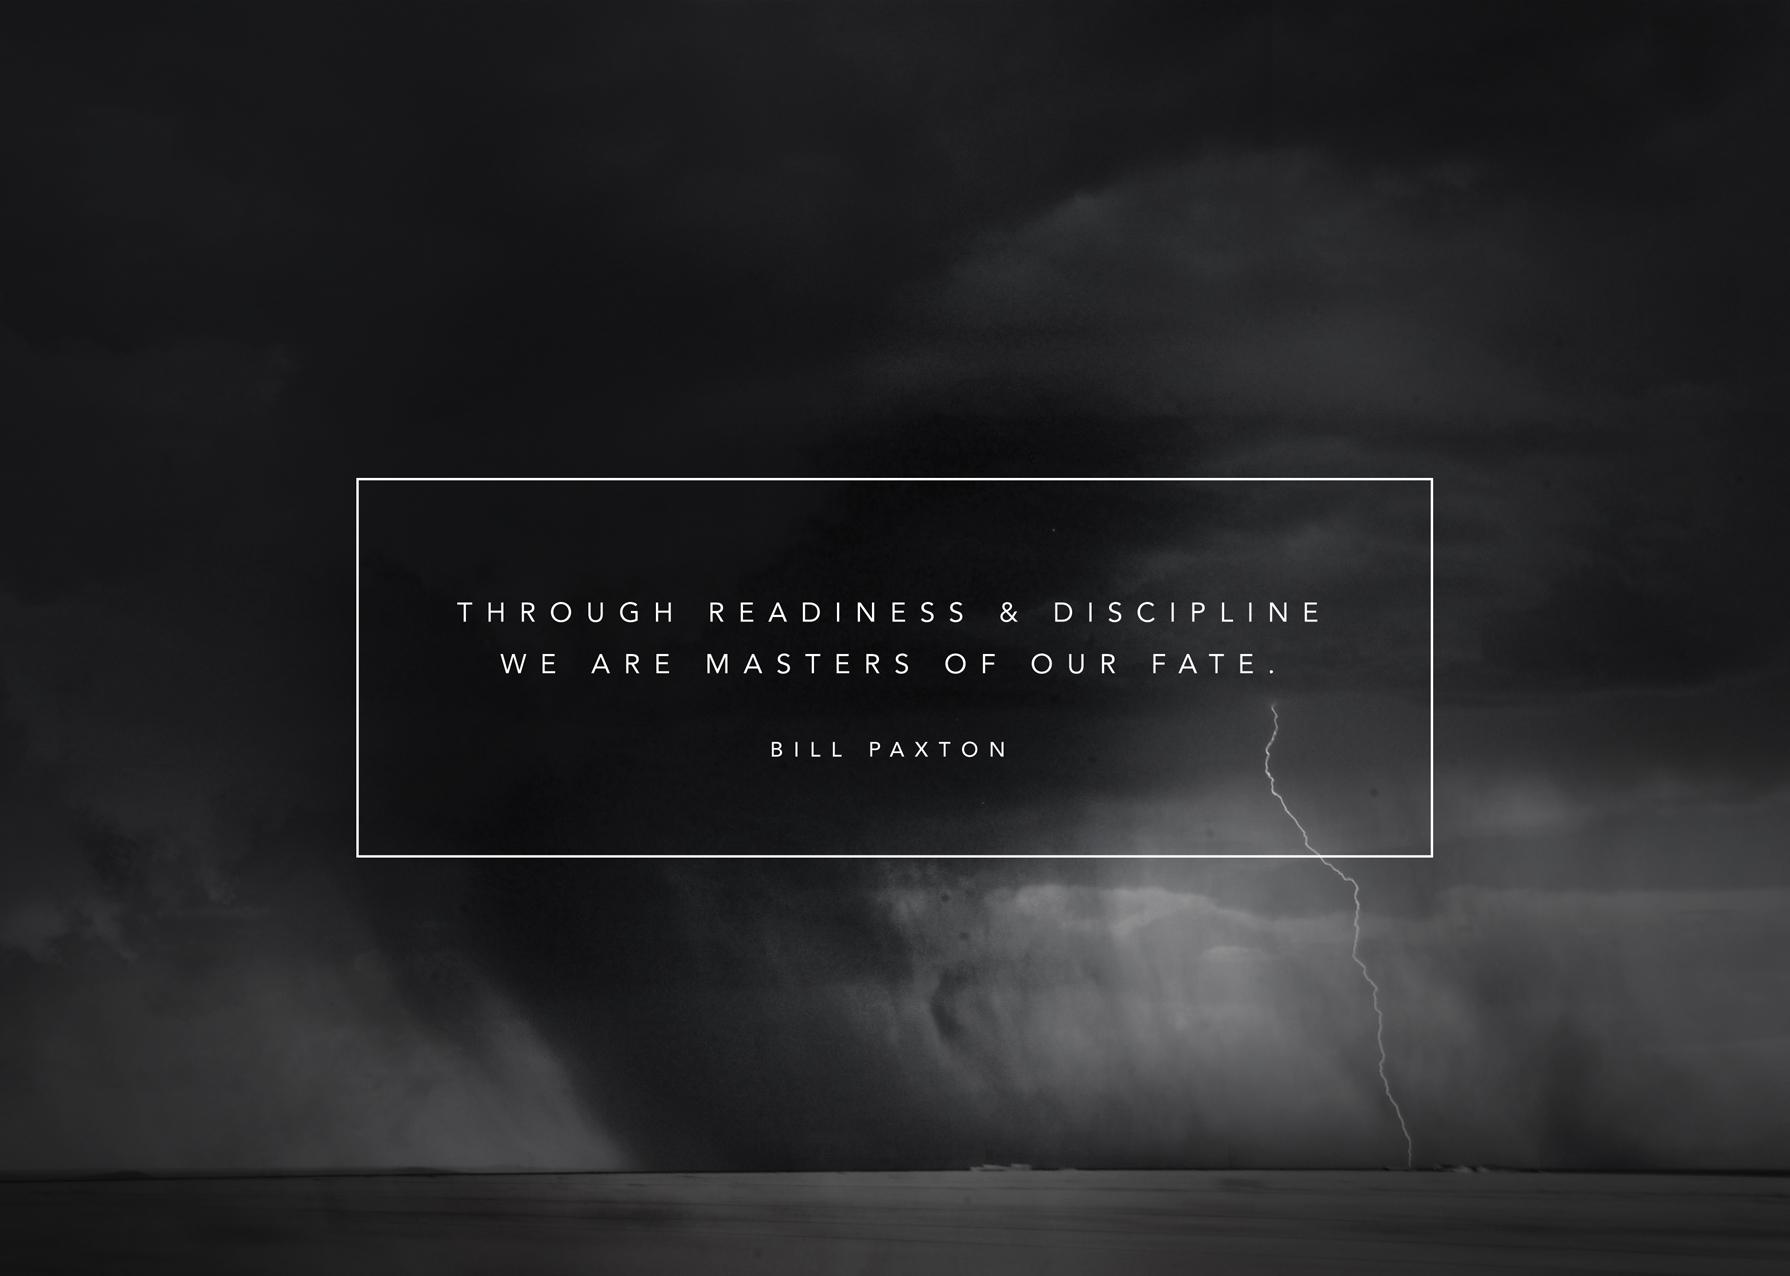 Readiness & Discipline by Bill Paxton | Design by Stephanie Mill | www.stephaniemill.com